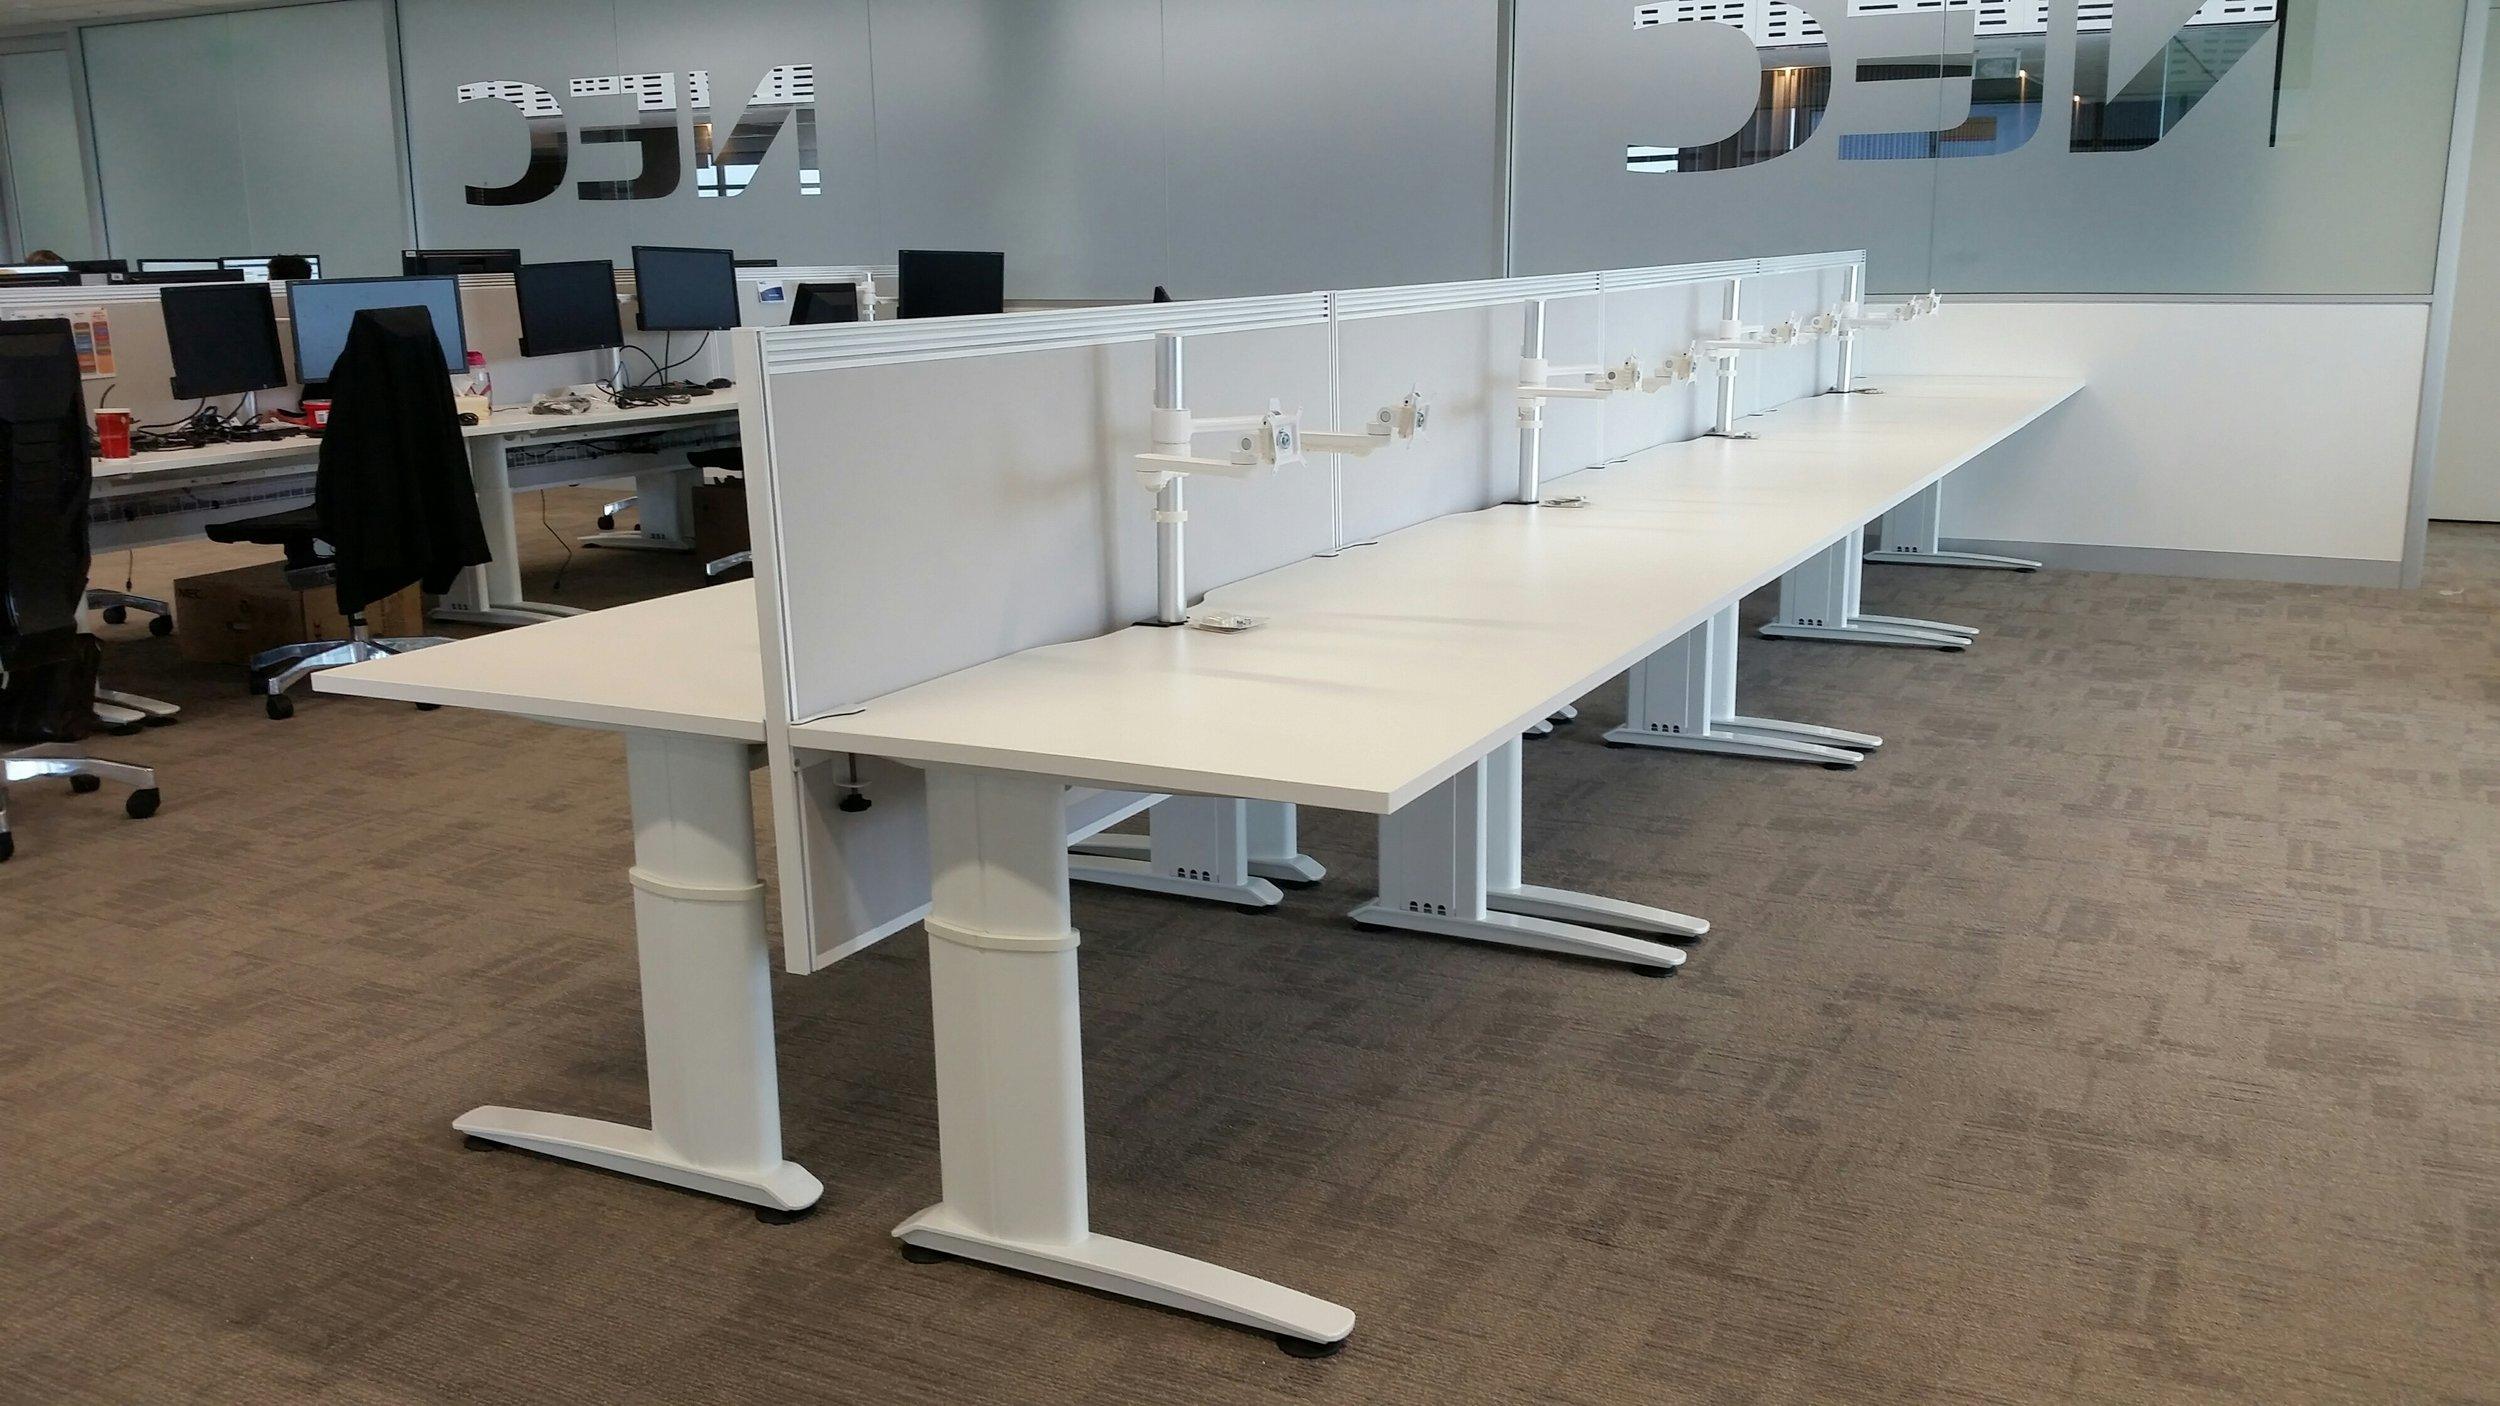 NEC_Wollongong_SMINational_Installation_2.jpg